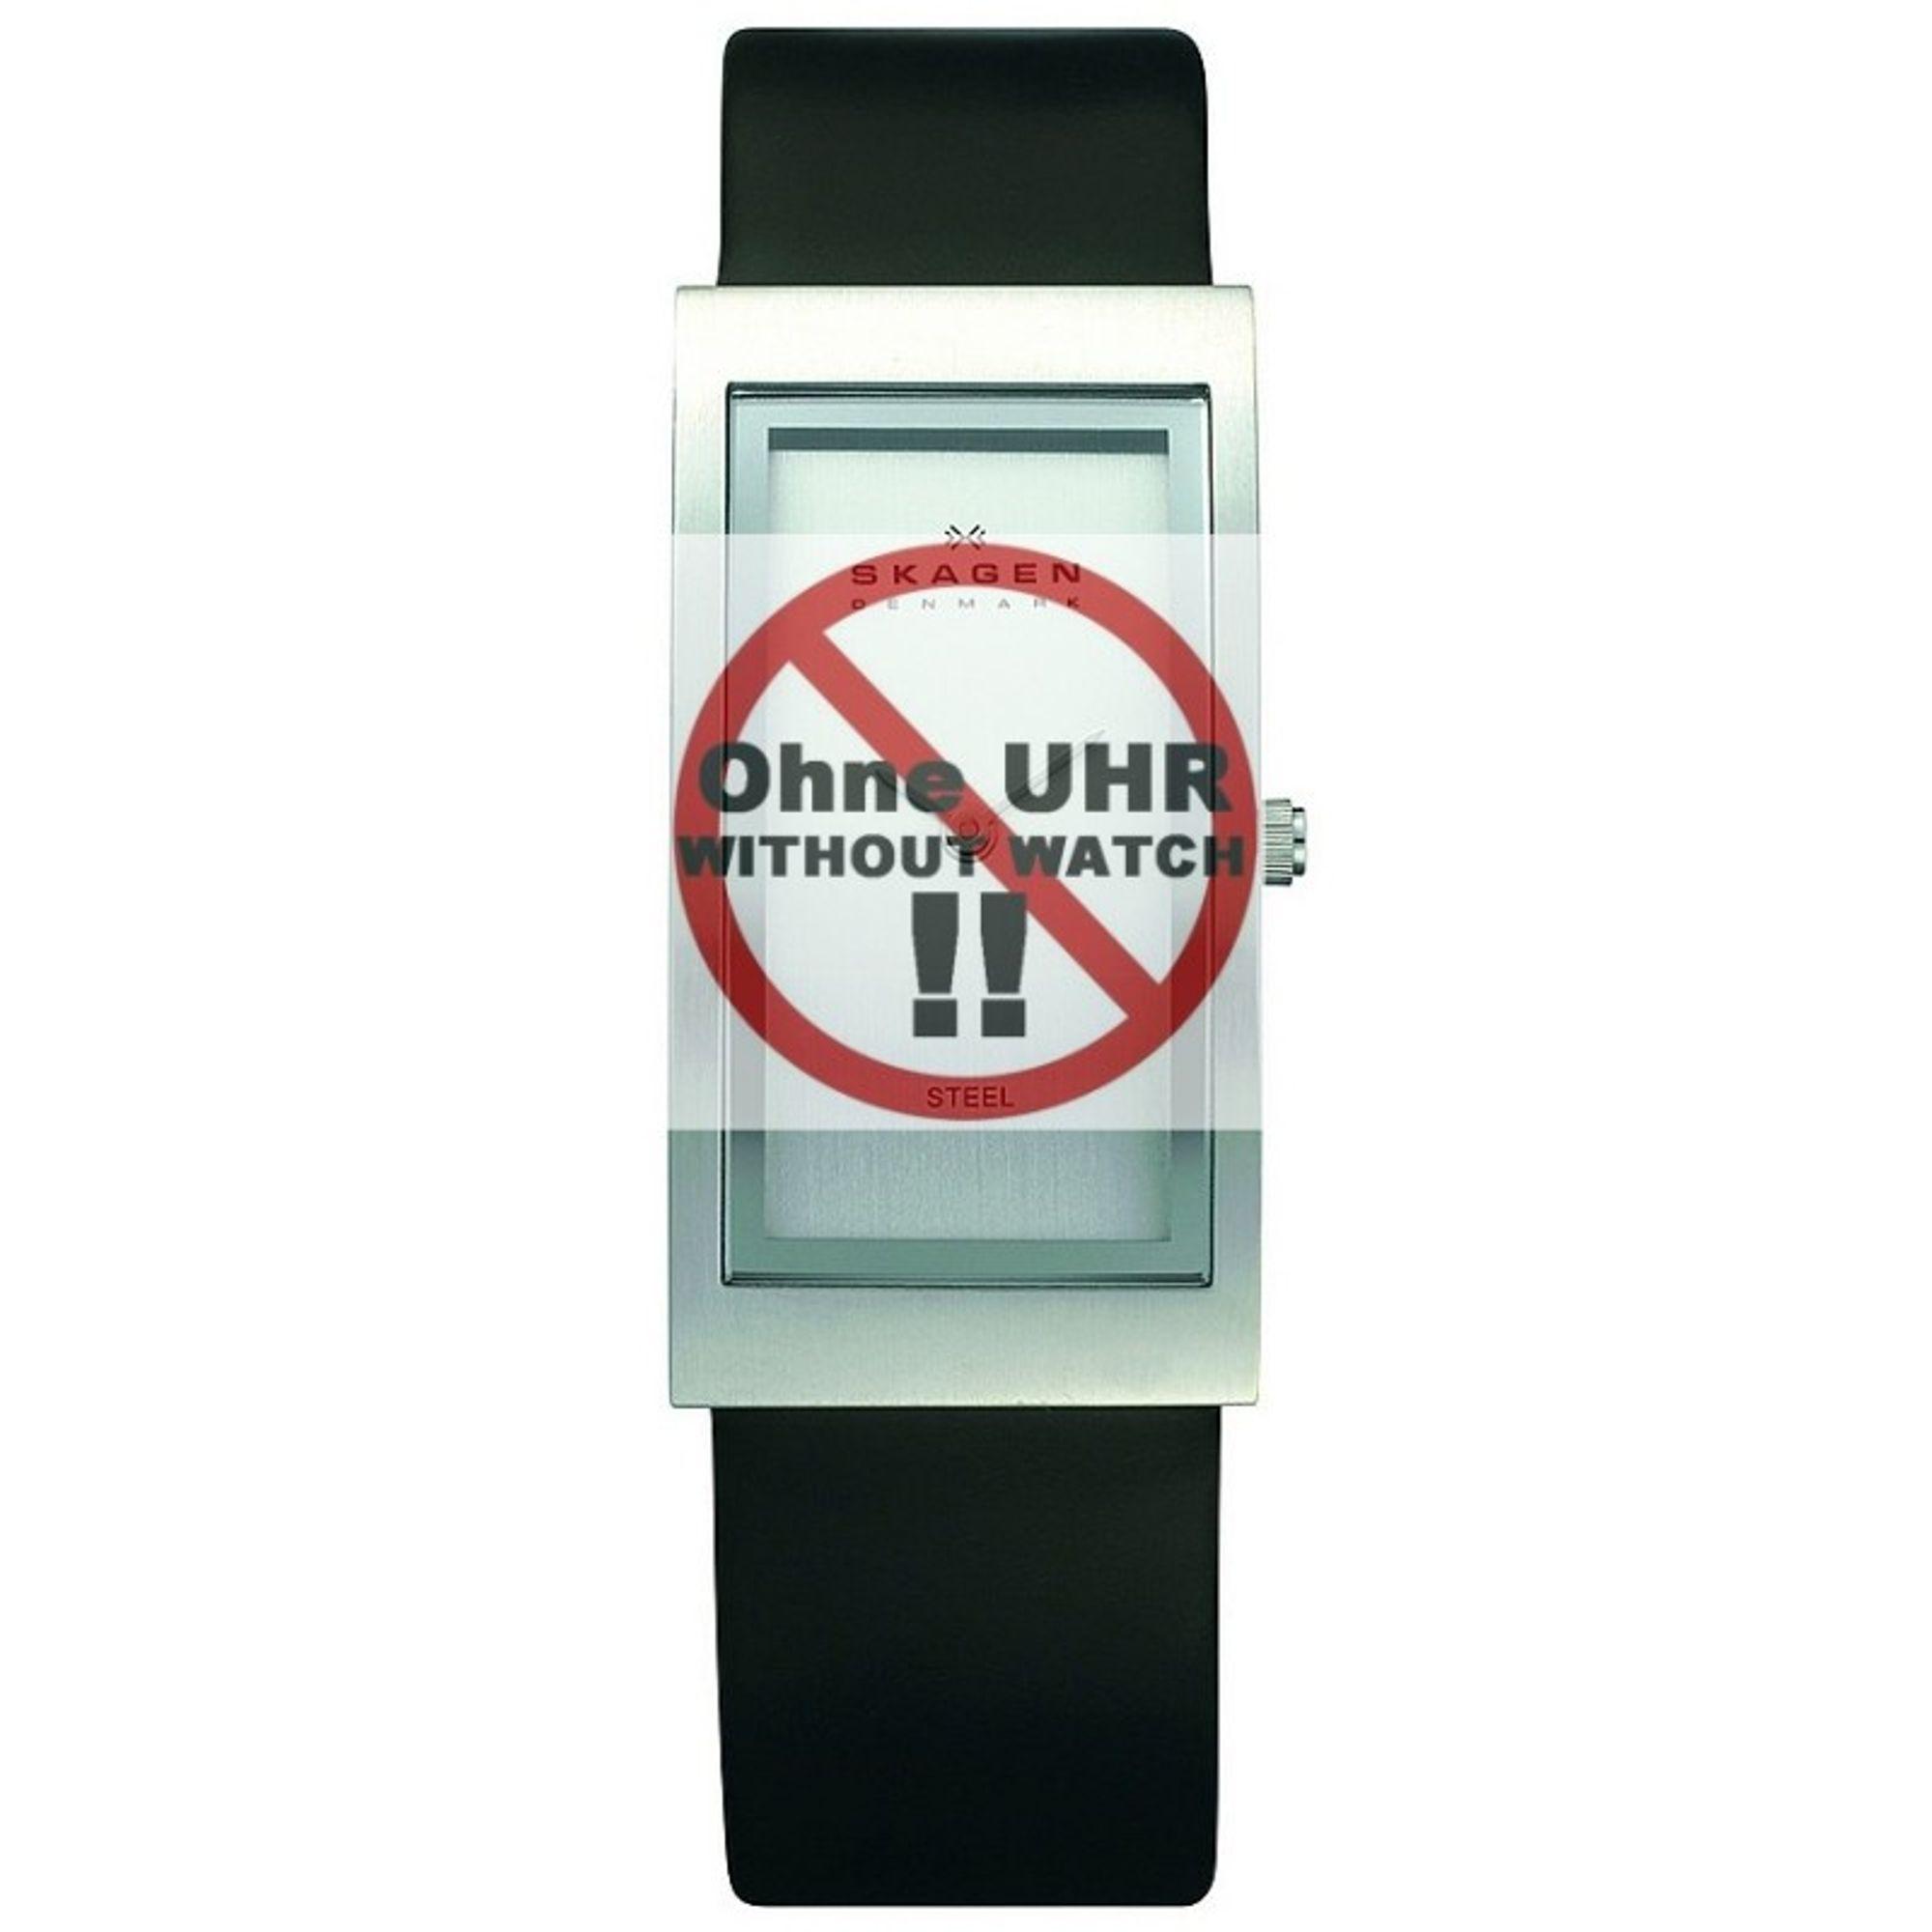 Skagen Uhrenarmband LB-359USLC Original Ersatzband 18 mm Schwarz